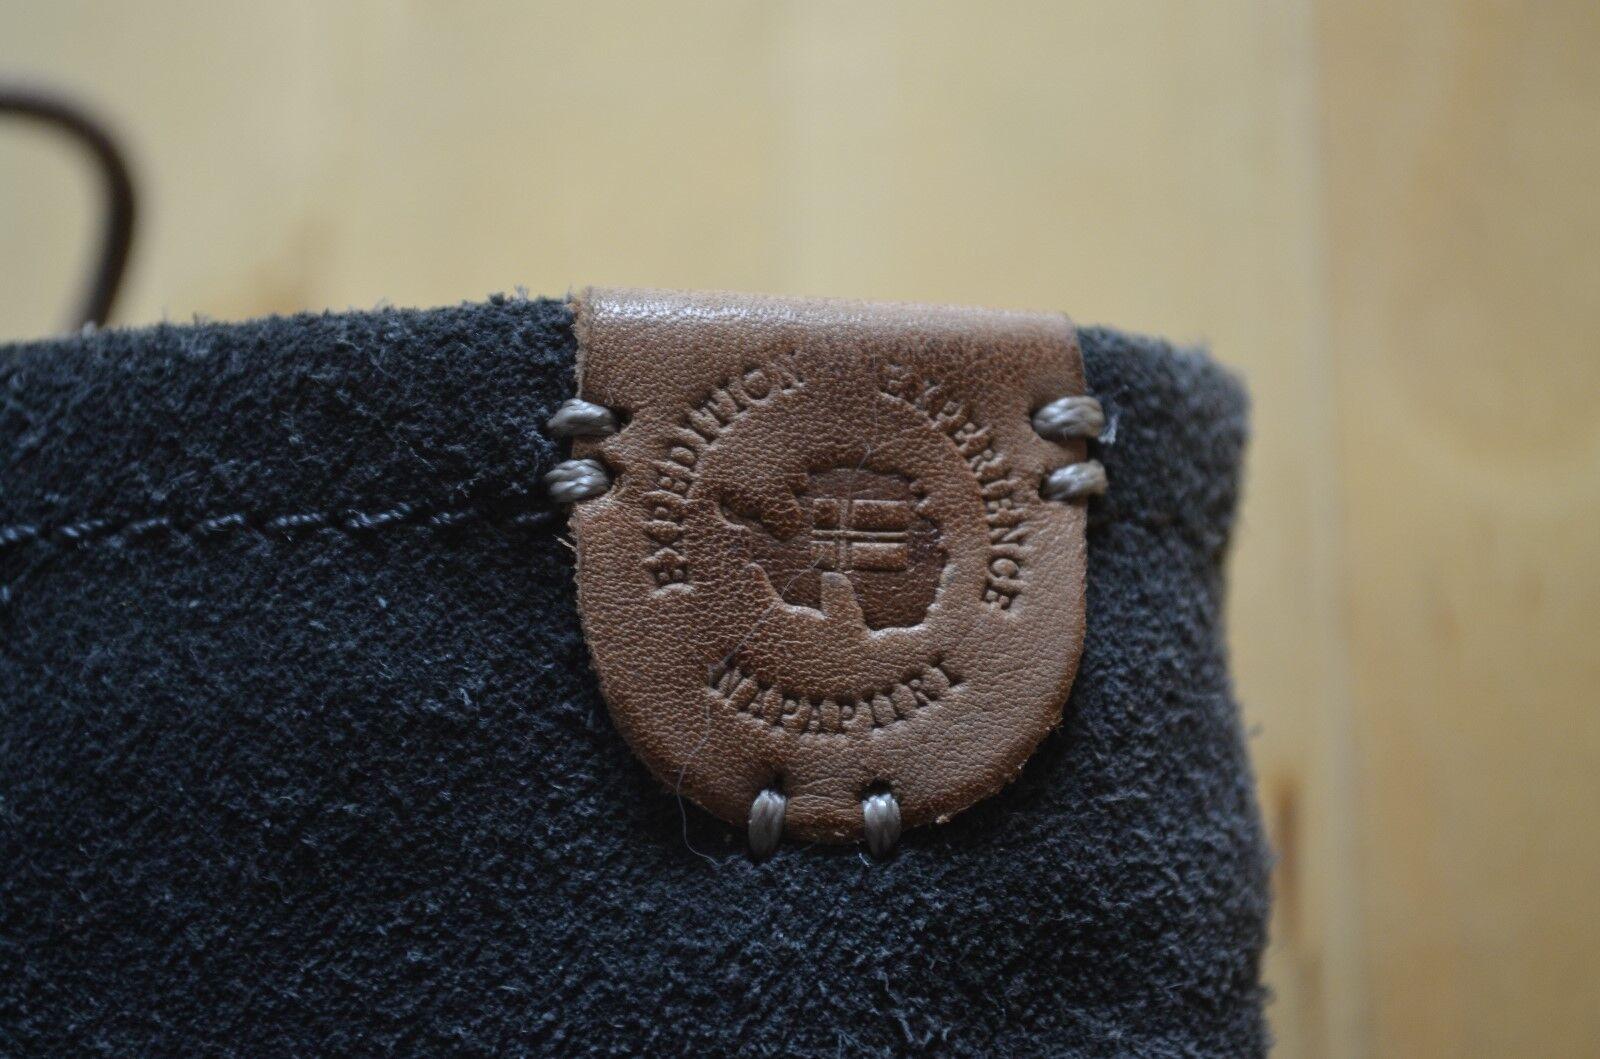 NAPAPIJRI 39,5 Stiefelette Stiefel - Damen Gr. 39 / 39,5 NAPAPIJRI ideal für d. Übergang 252bdd